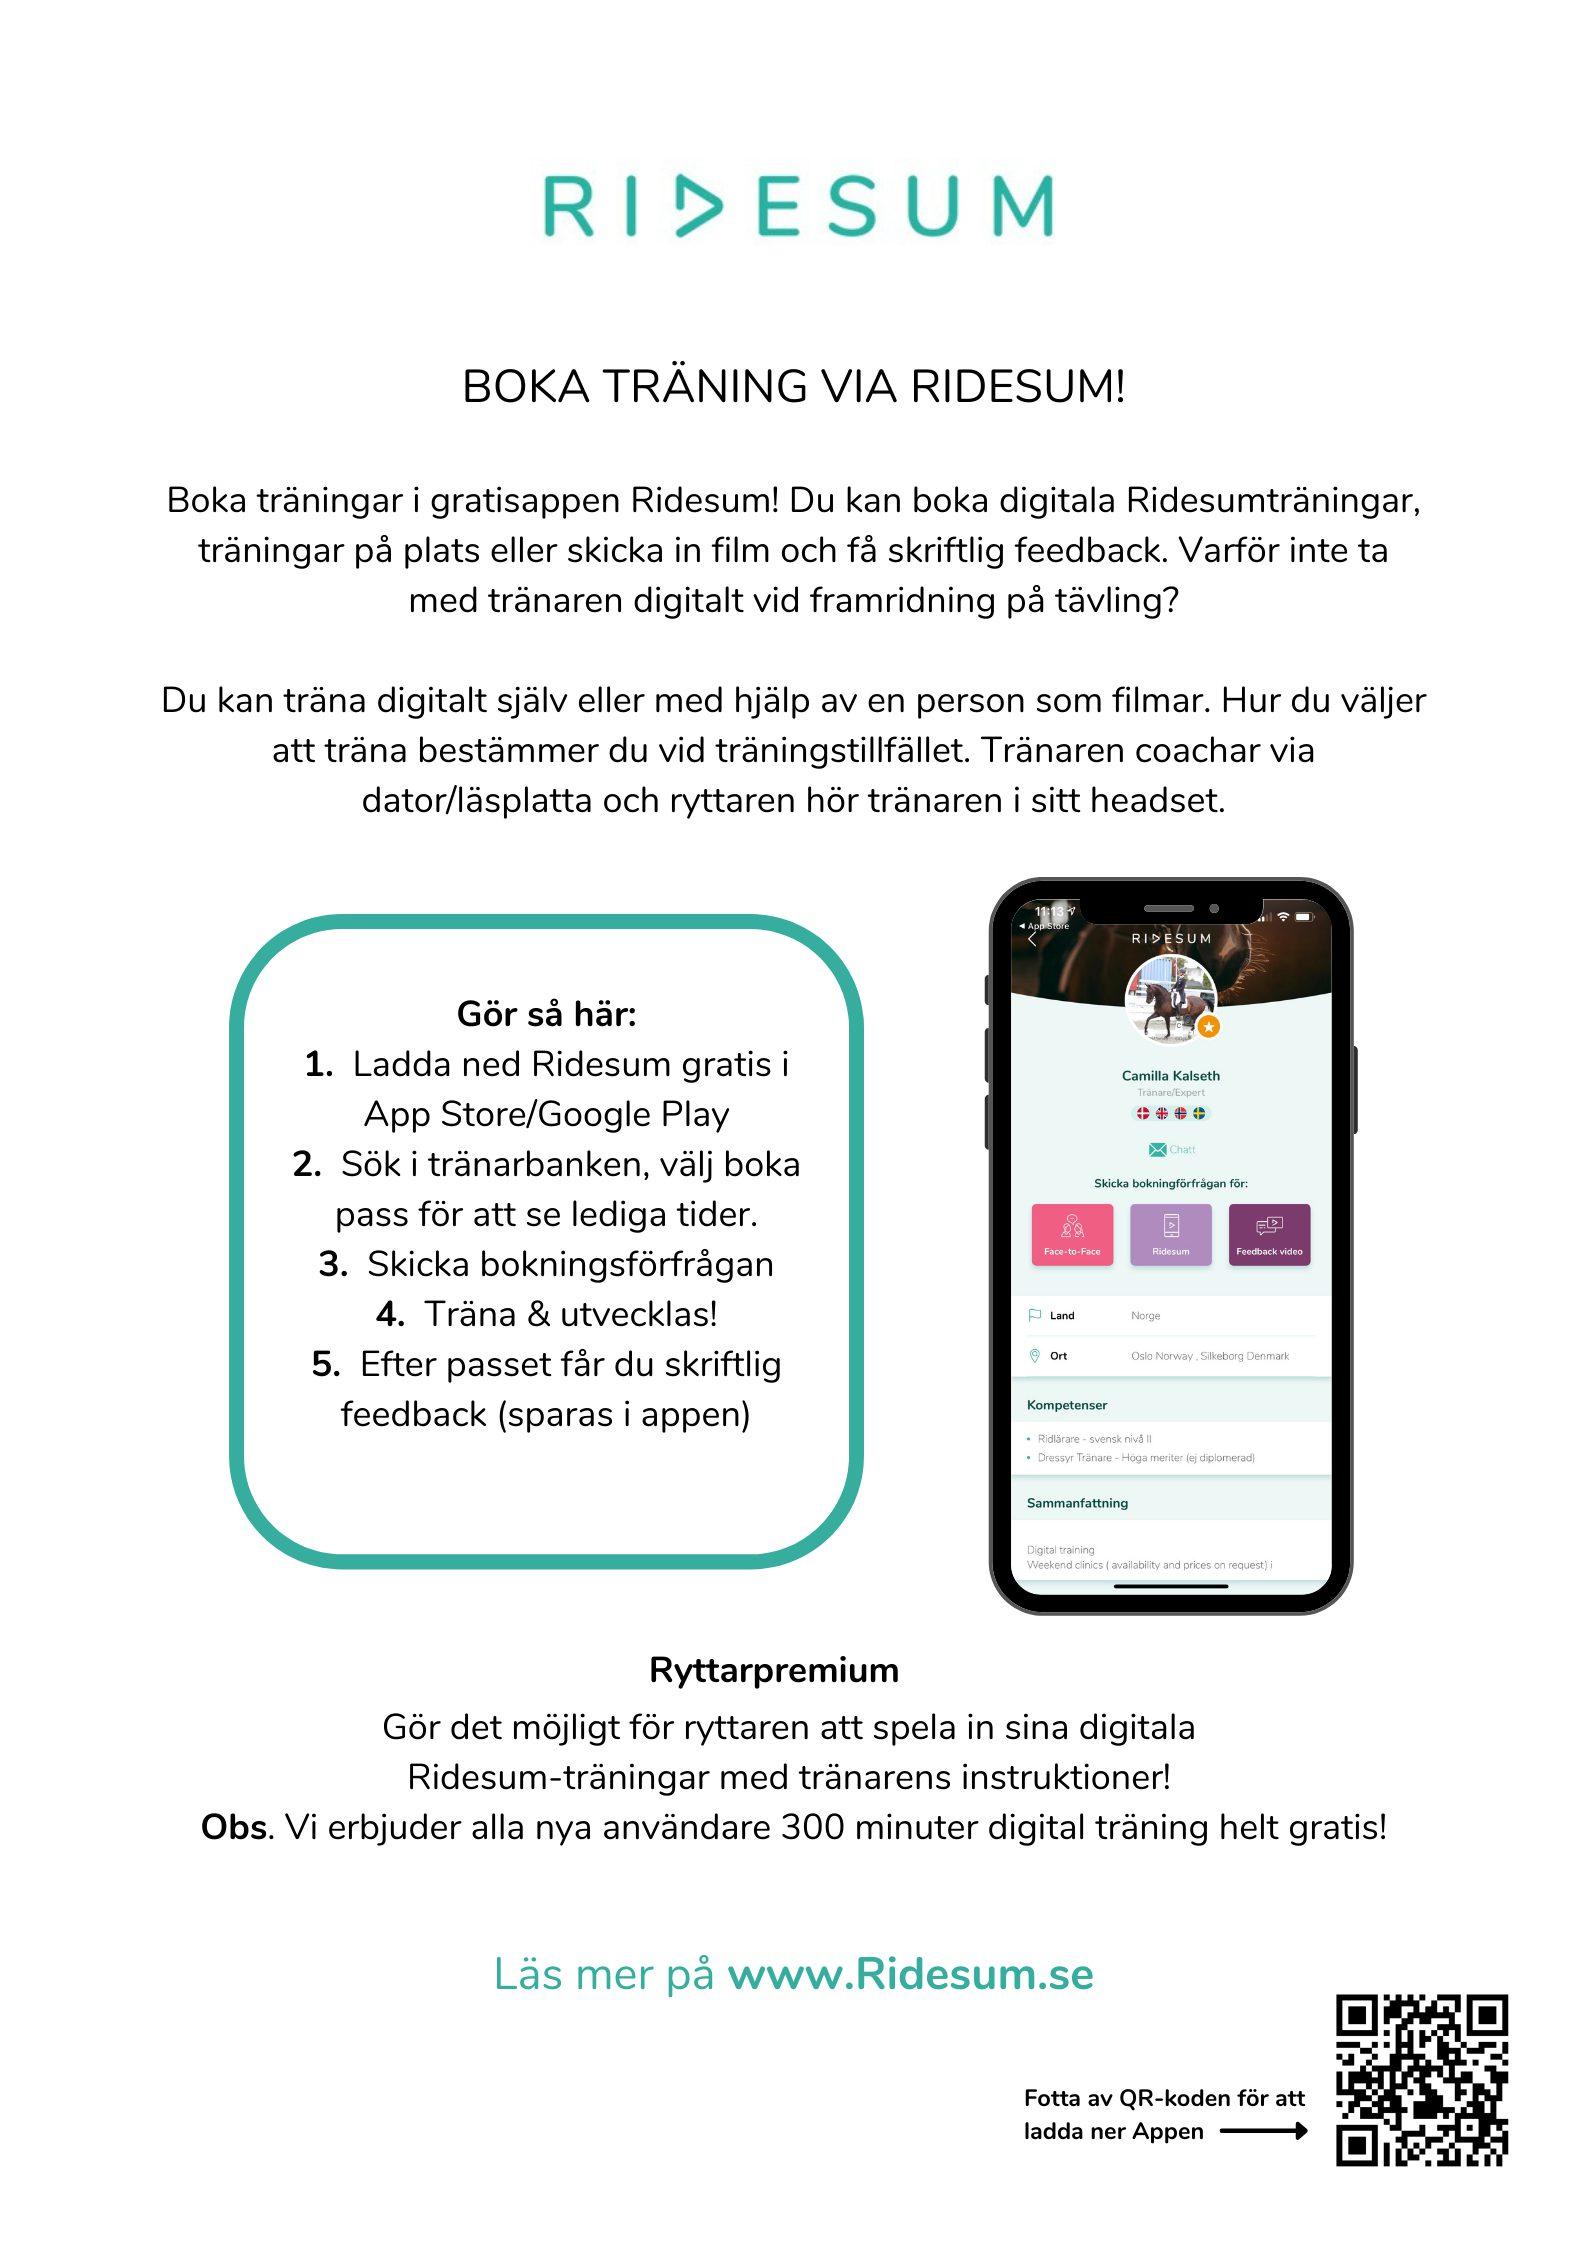 Bild: Boka träning via Ridesum poster